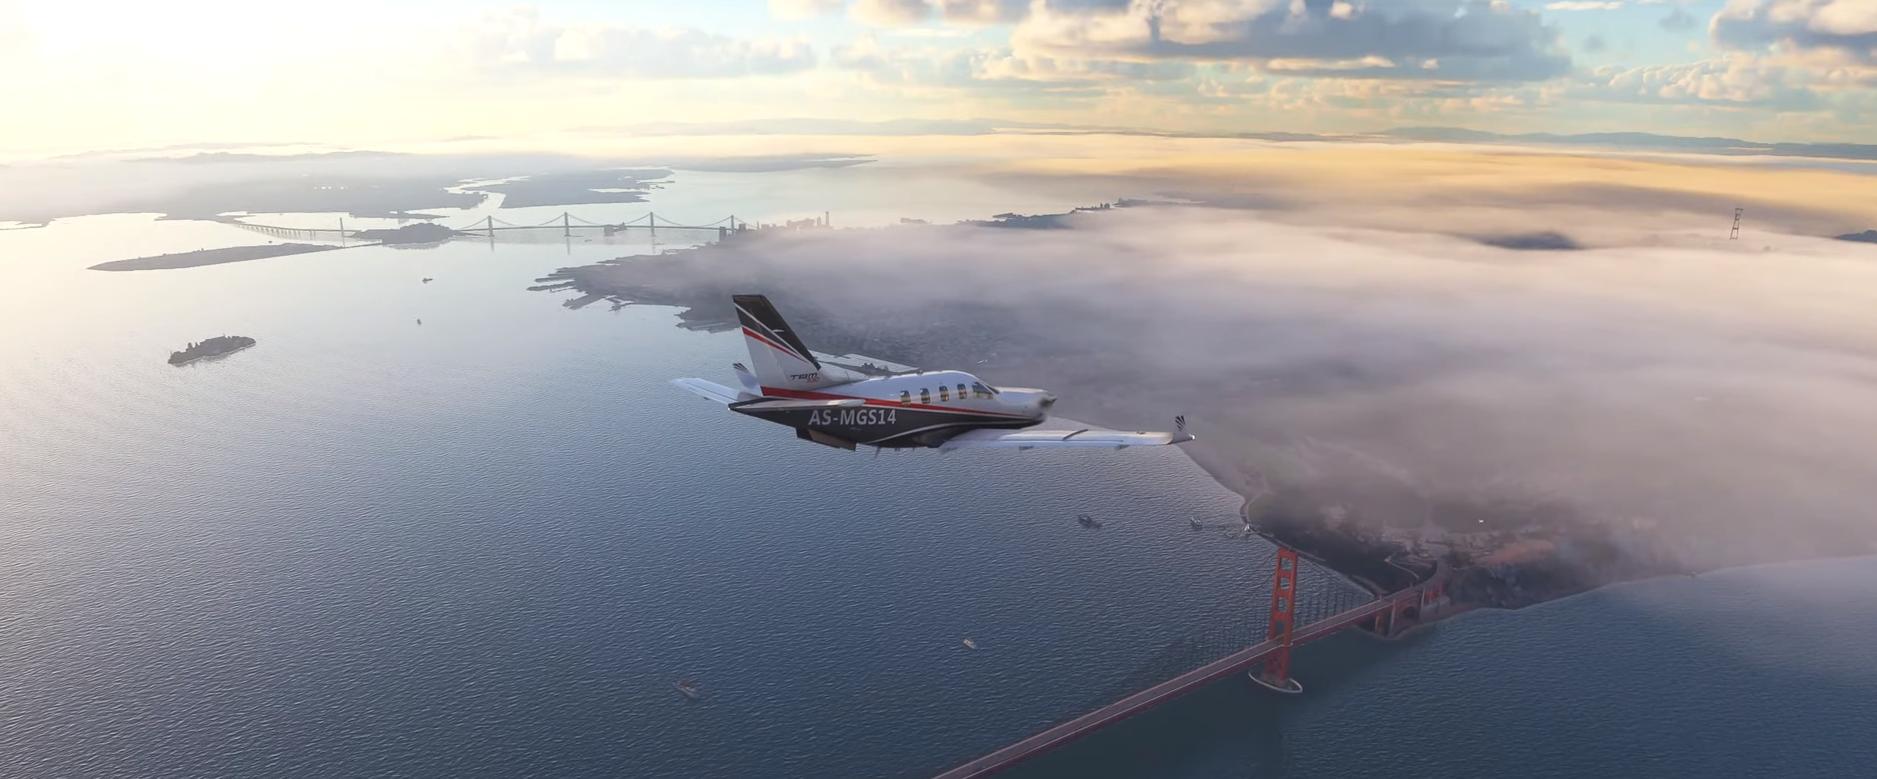 Microsoft flight simulator 2019 télécharger complete version